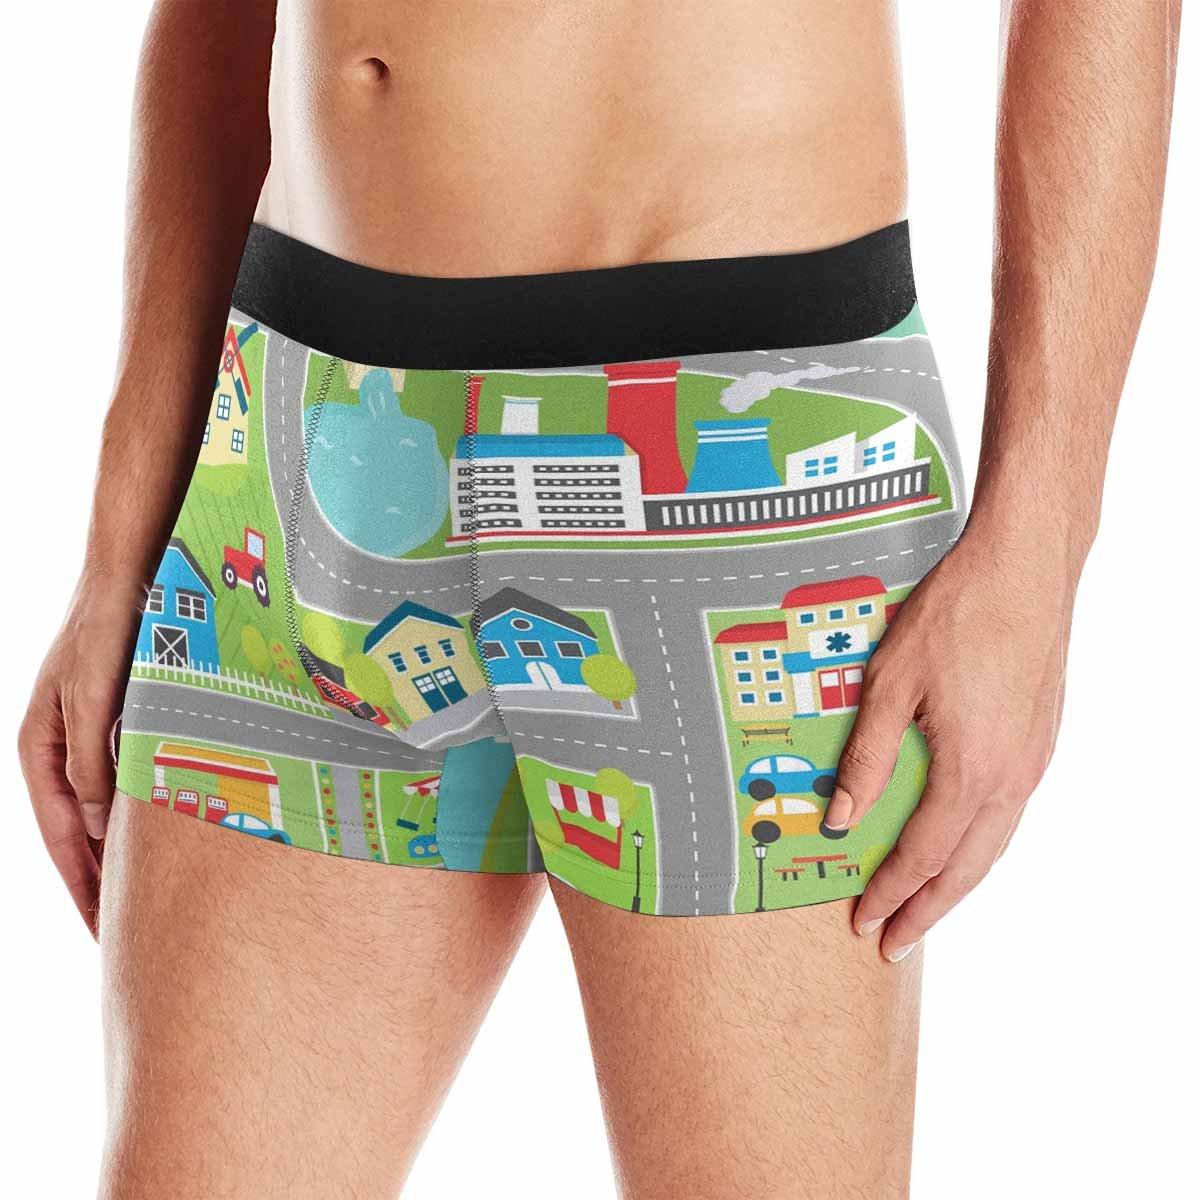 XS-3XL INTERESTPRINT Boxer Briefs Mens Underwear Childrens Educational Playtime Road Map City Landscape Map